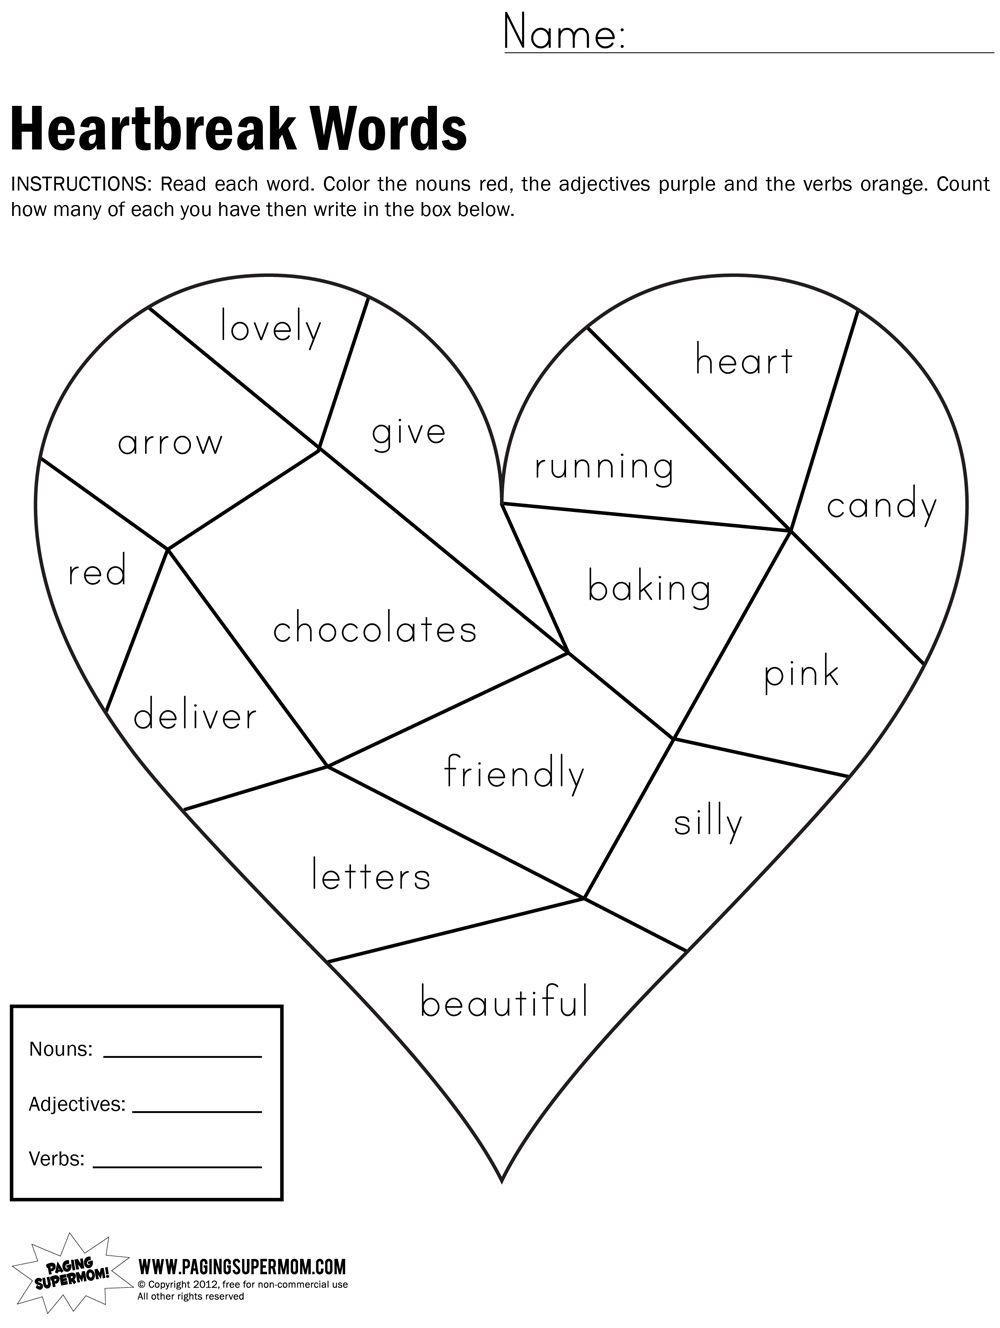 Heartbreak Words Free Printable Worksheet | Education---February - Free Printable Valentine Math Worksheets